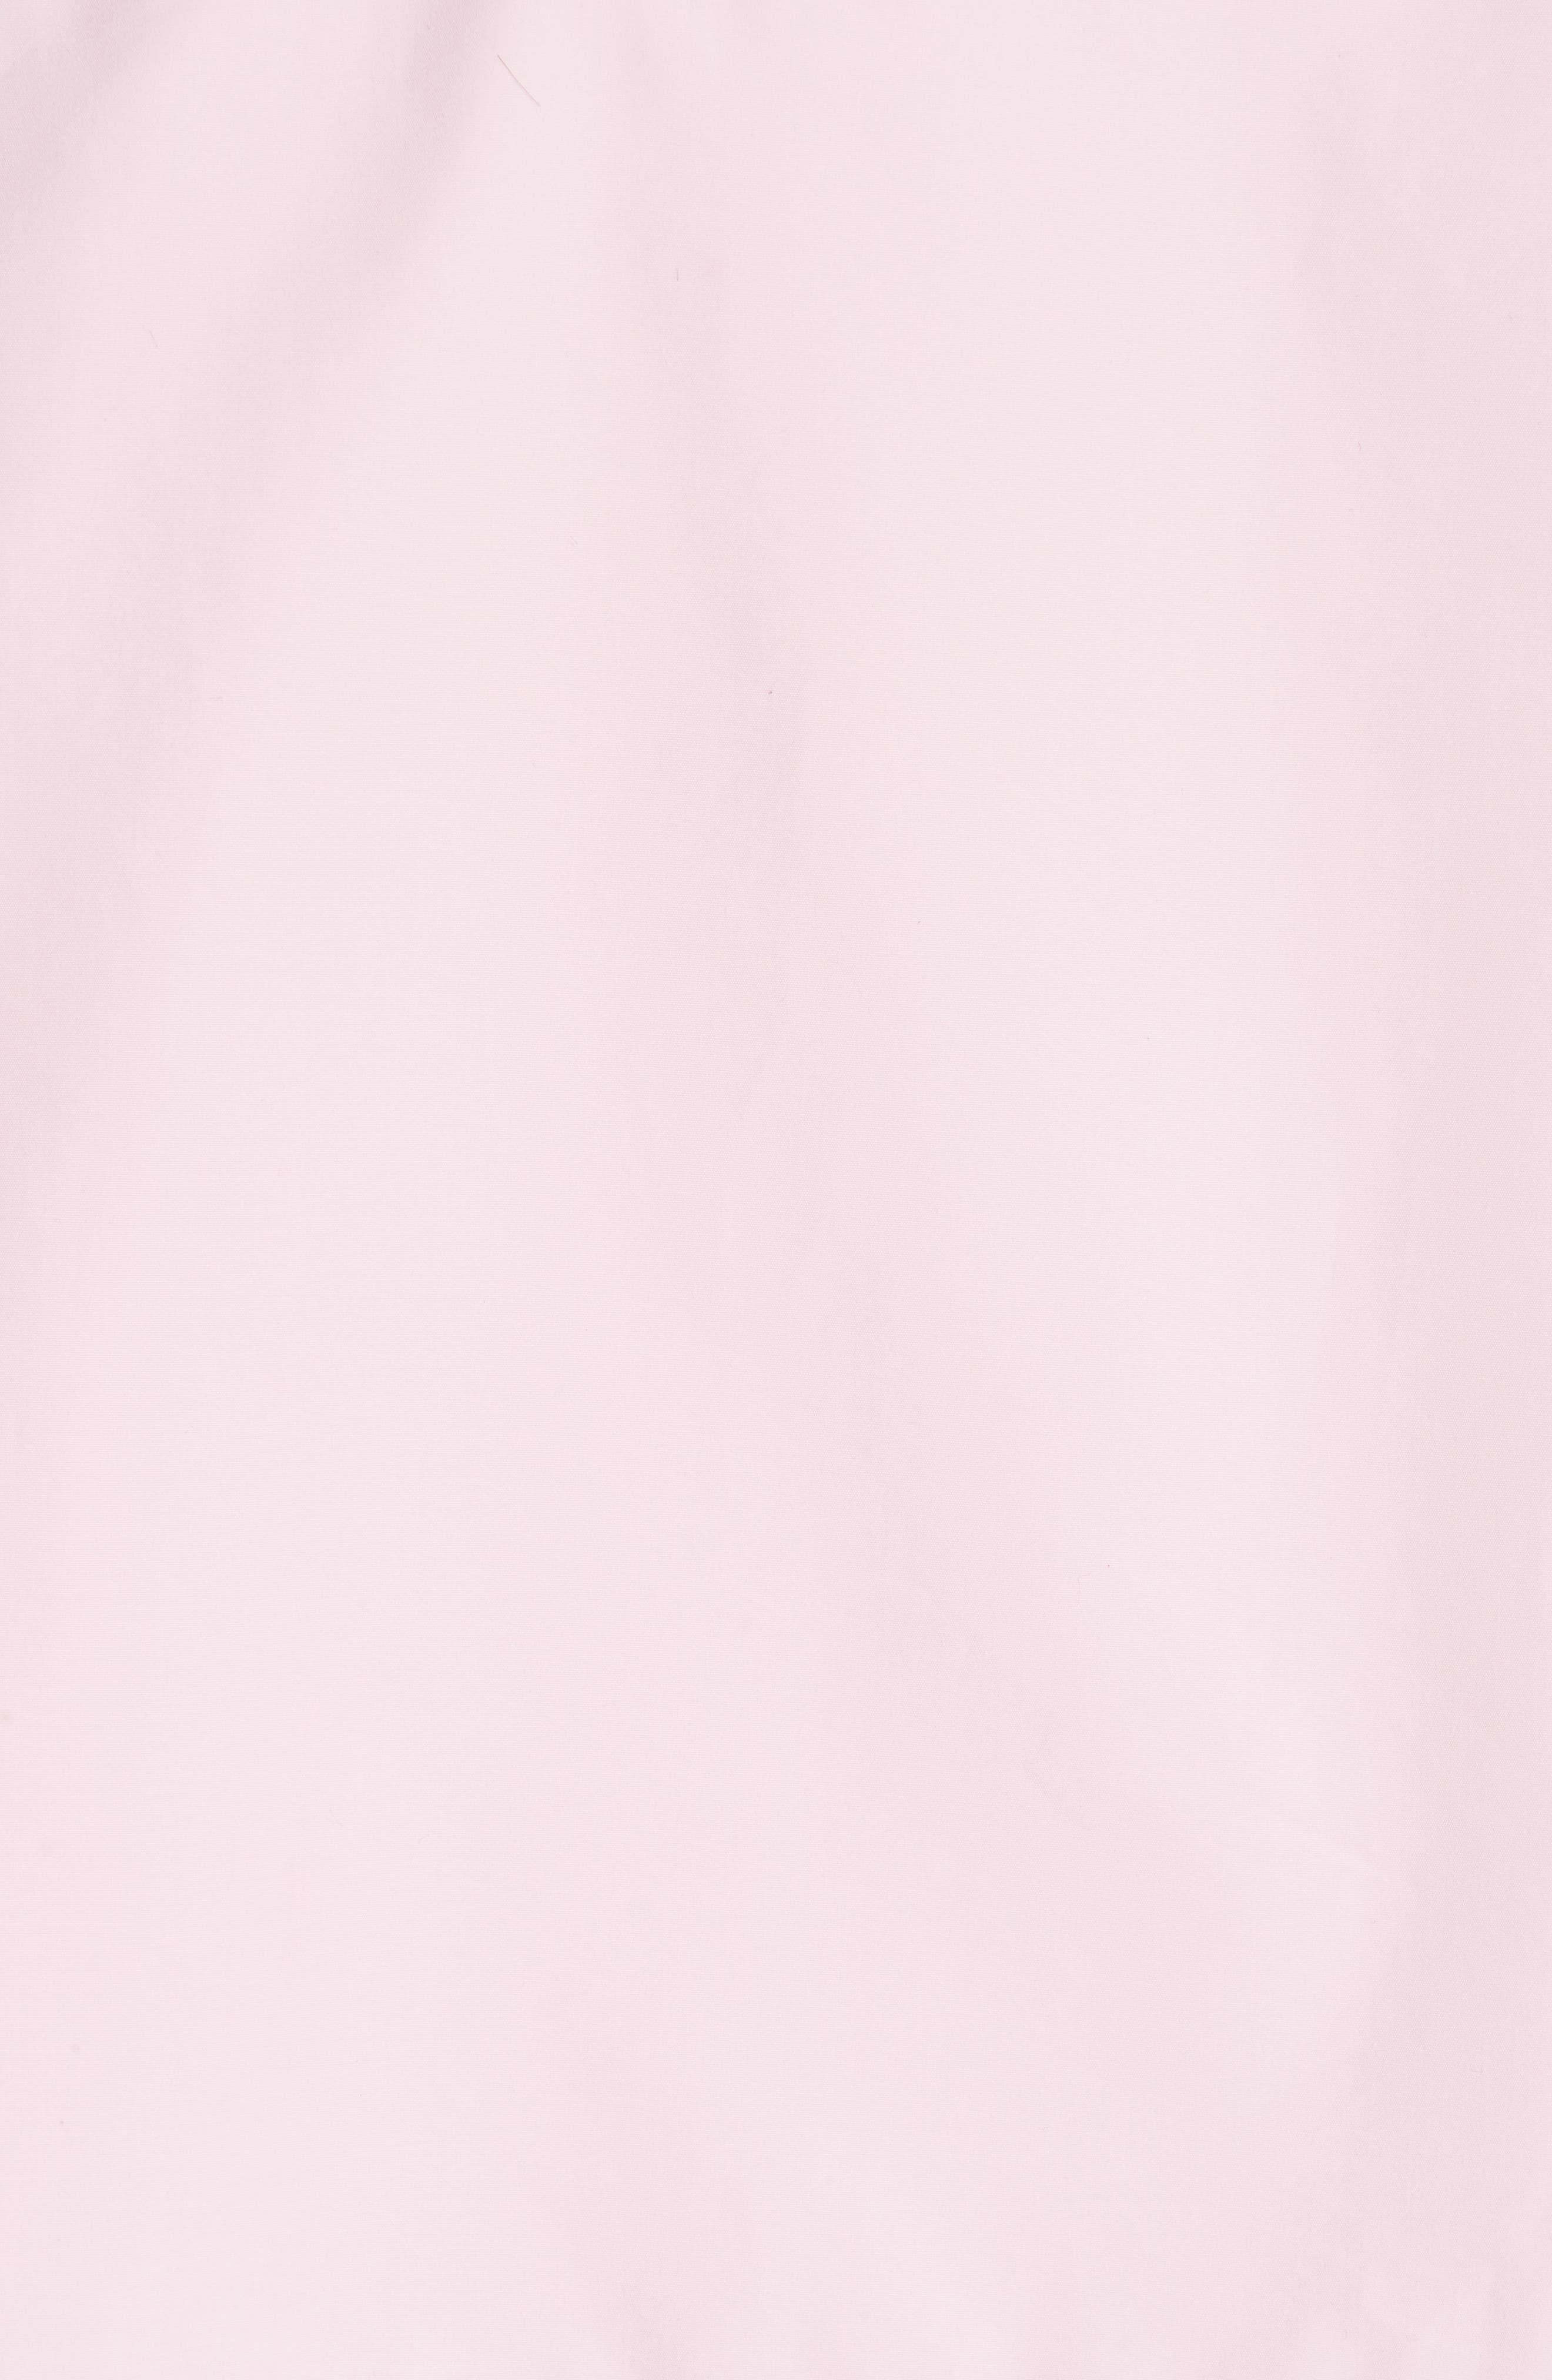 CALVIN KLEIN 205W39NYC, Layered Cotton Poplin Shirt, Alternate thumbnail 7, color, ROSE OPTIC WHITE